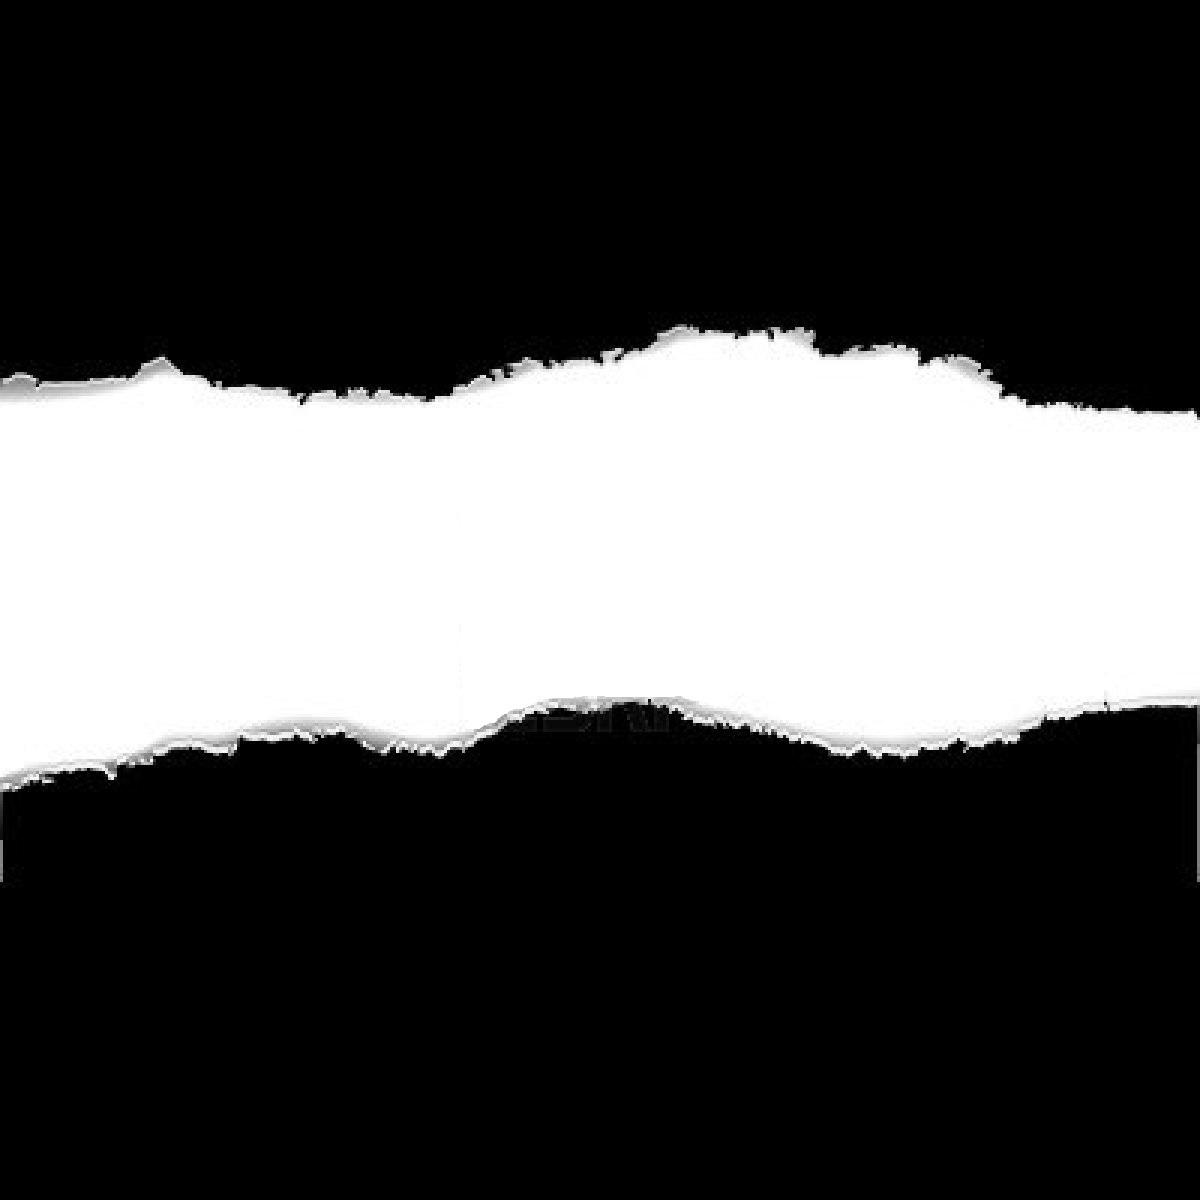 15759810-2-black-torn-paper-borders-illustration.jpg